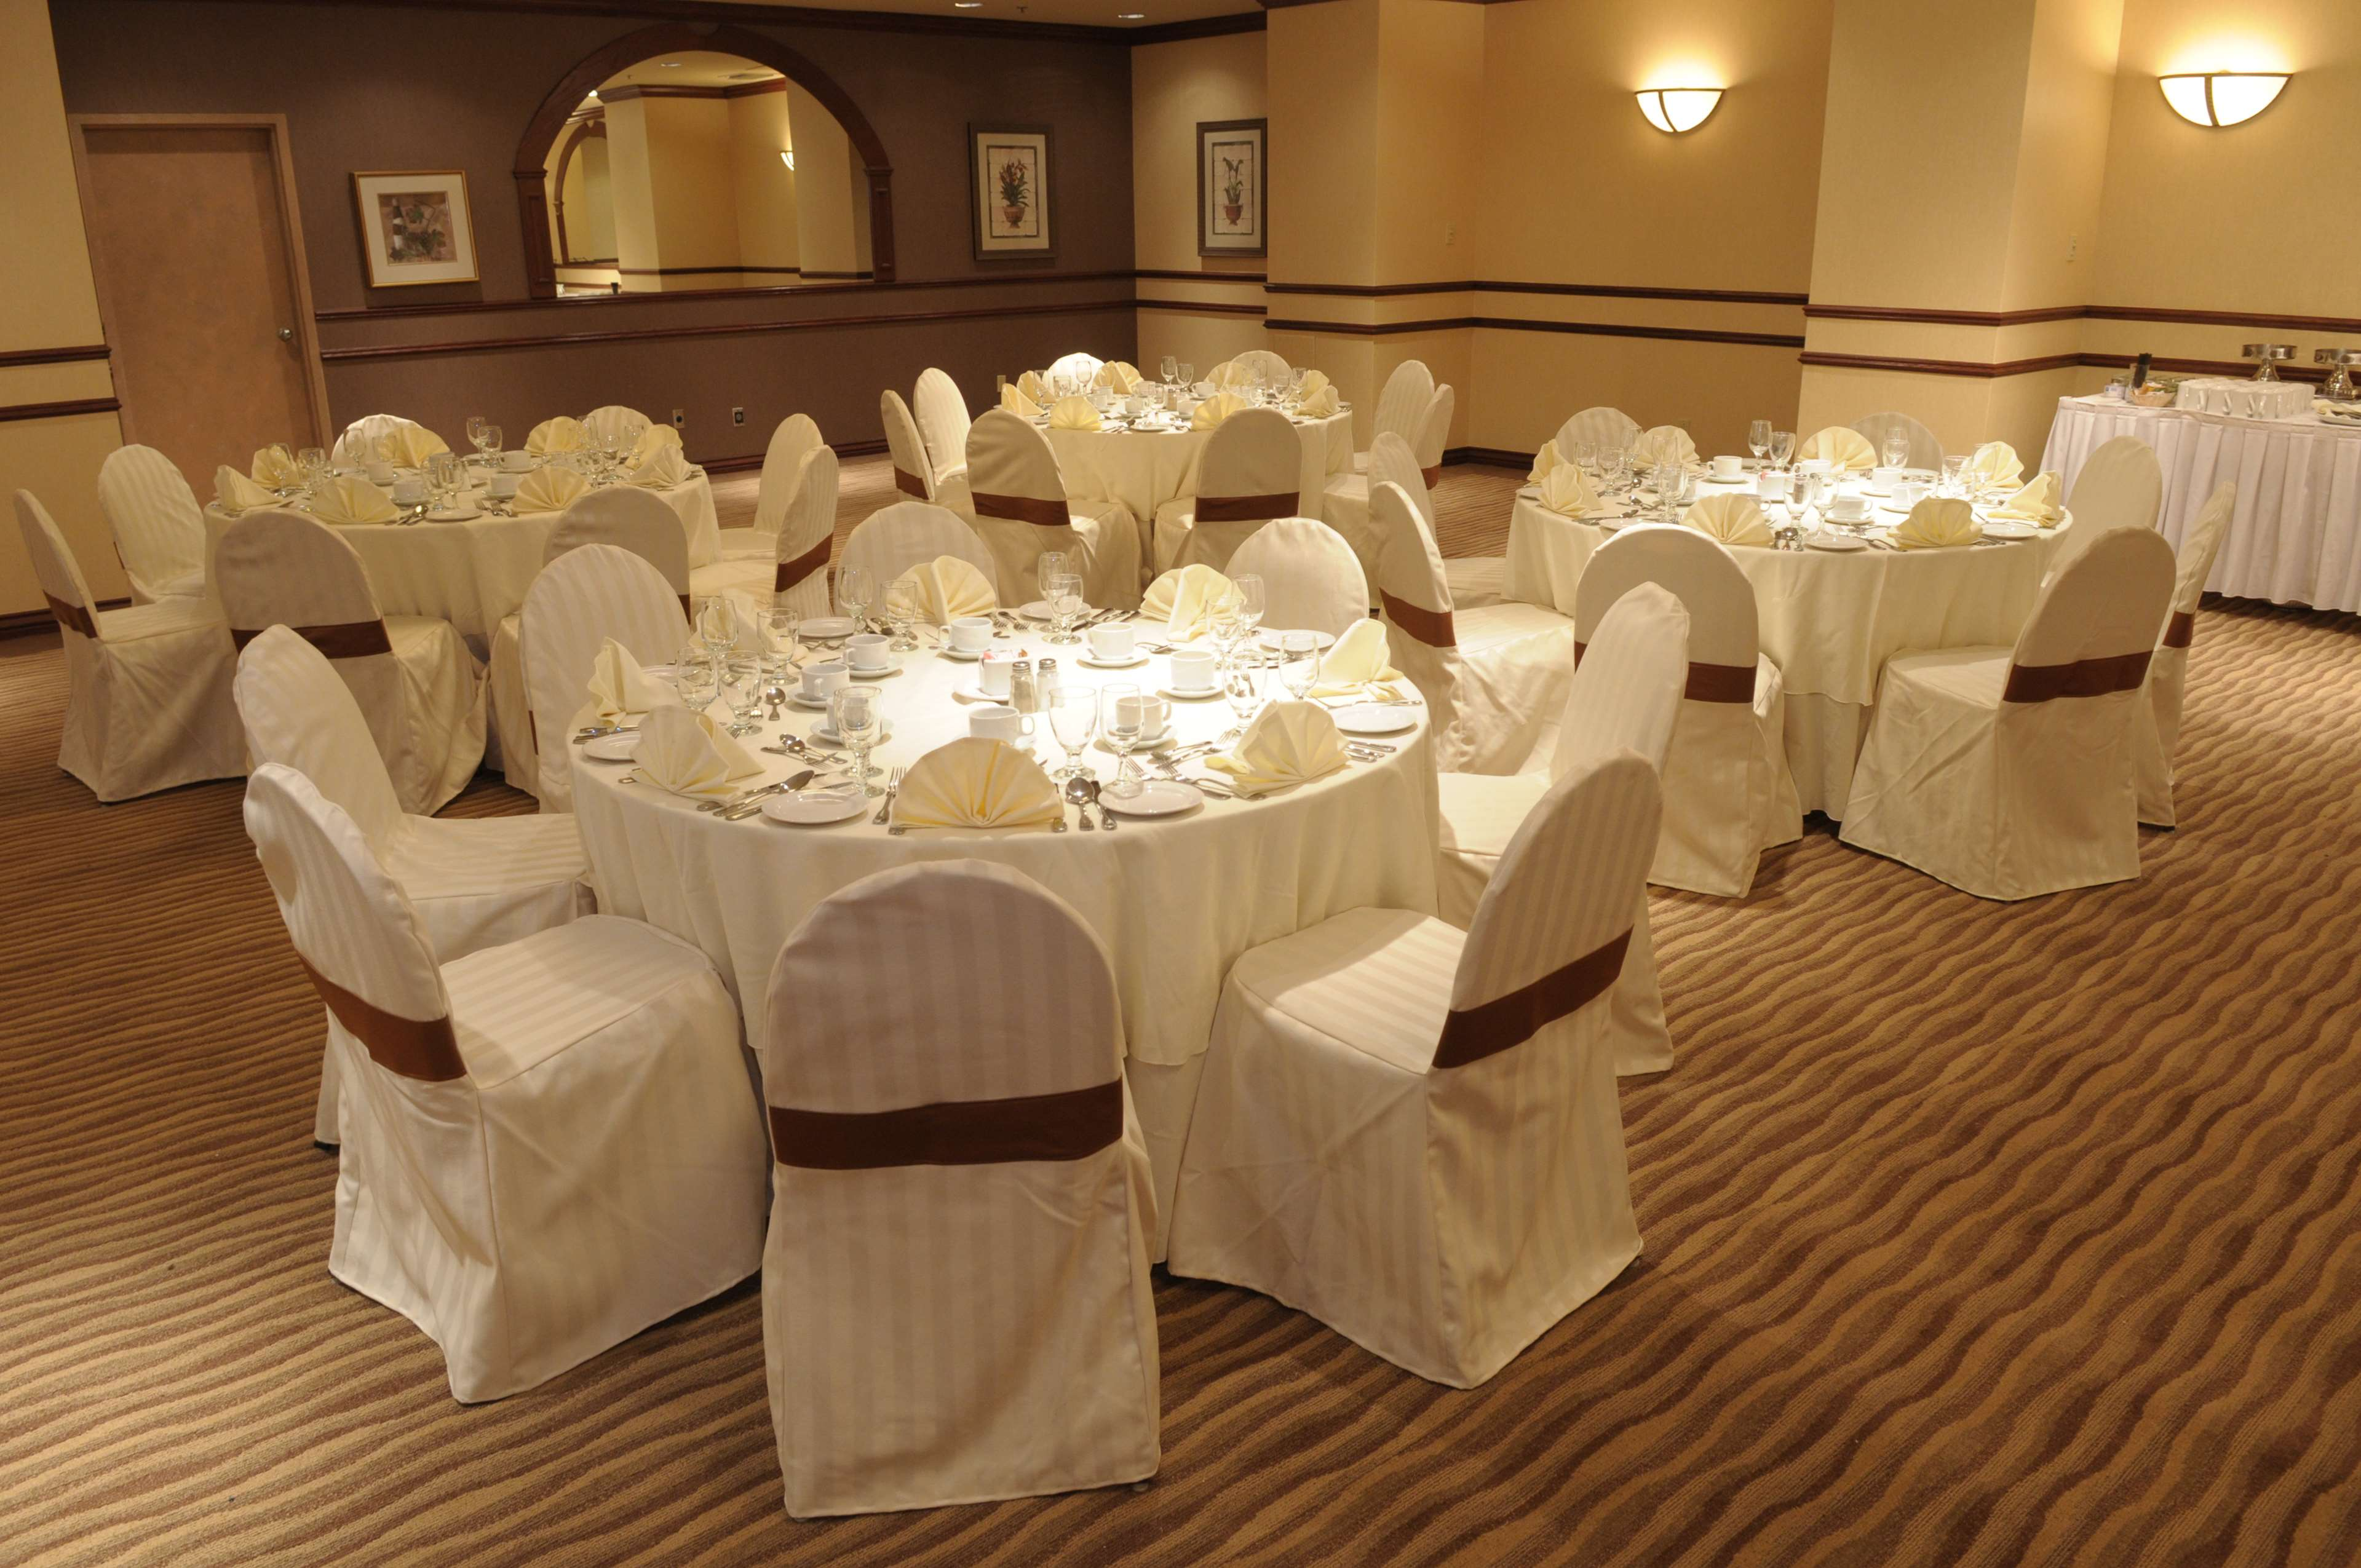 Best Western Ville-Marie Montreal Hotel & Suites à Montreal: Grand Salon Banquet Room